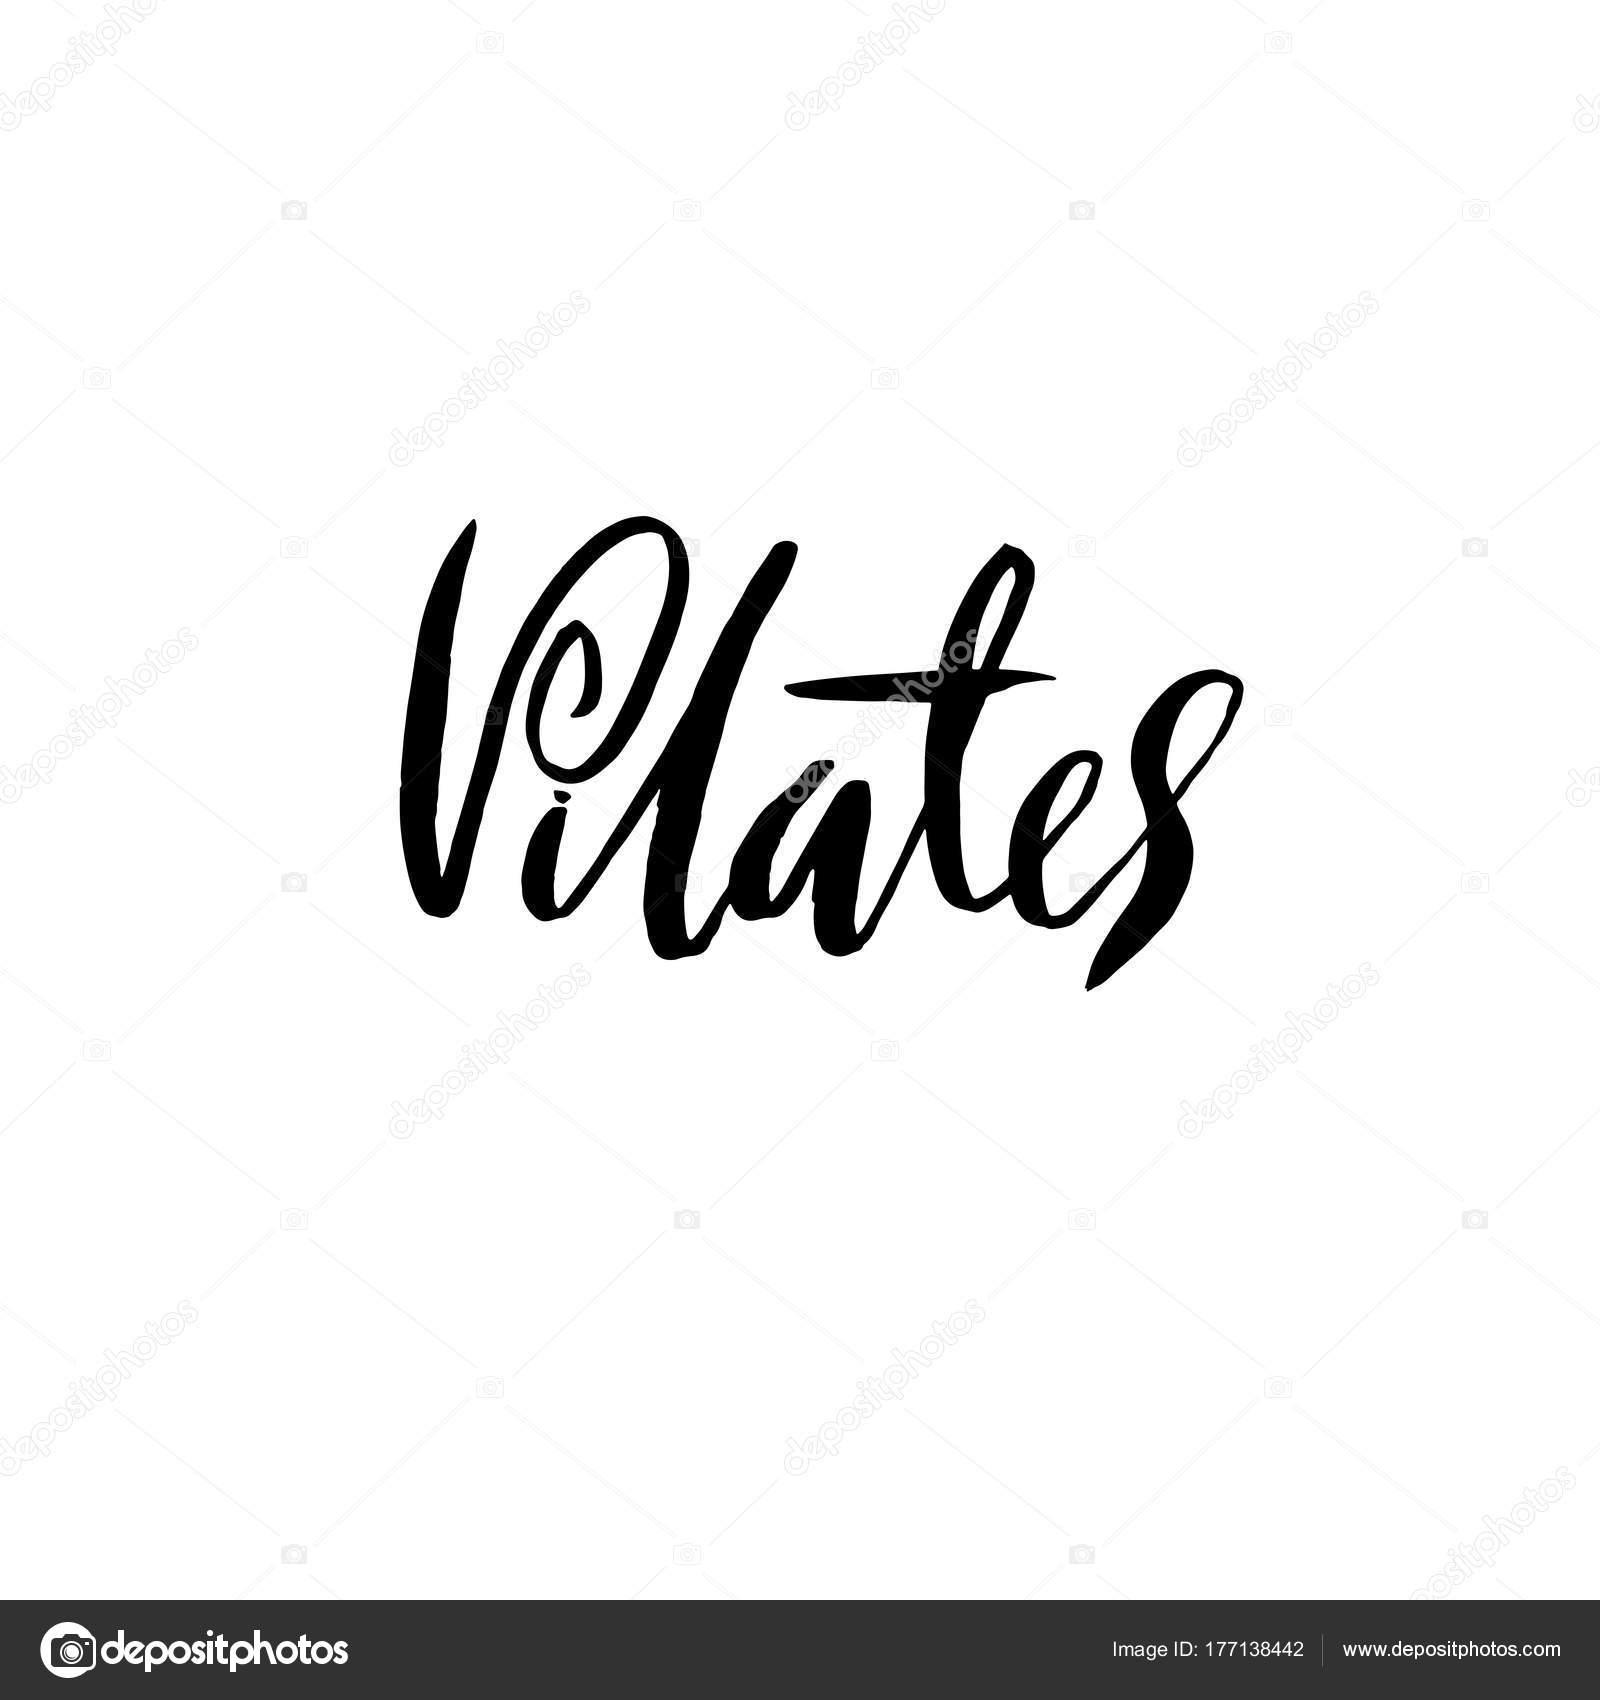 Imágenes Pilates Para Imprimir Clase De Pilates Letras